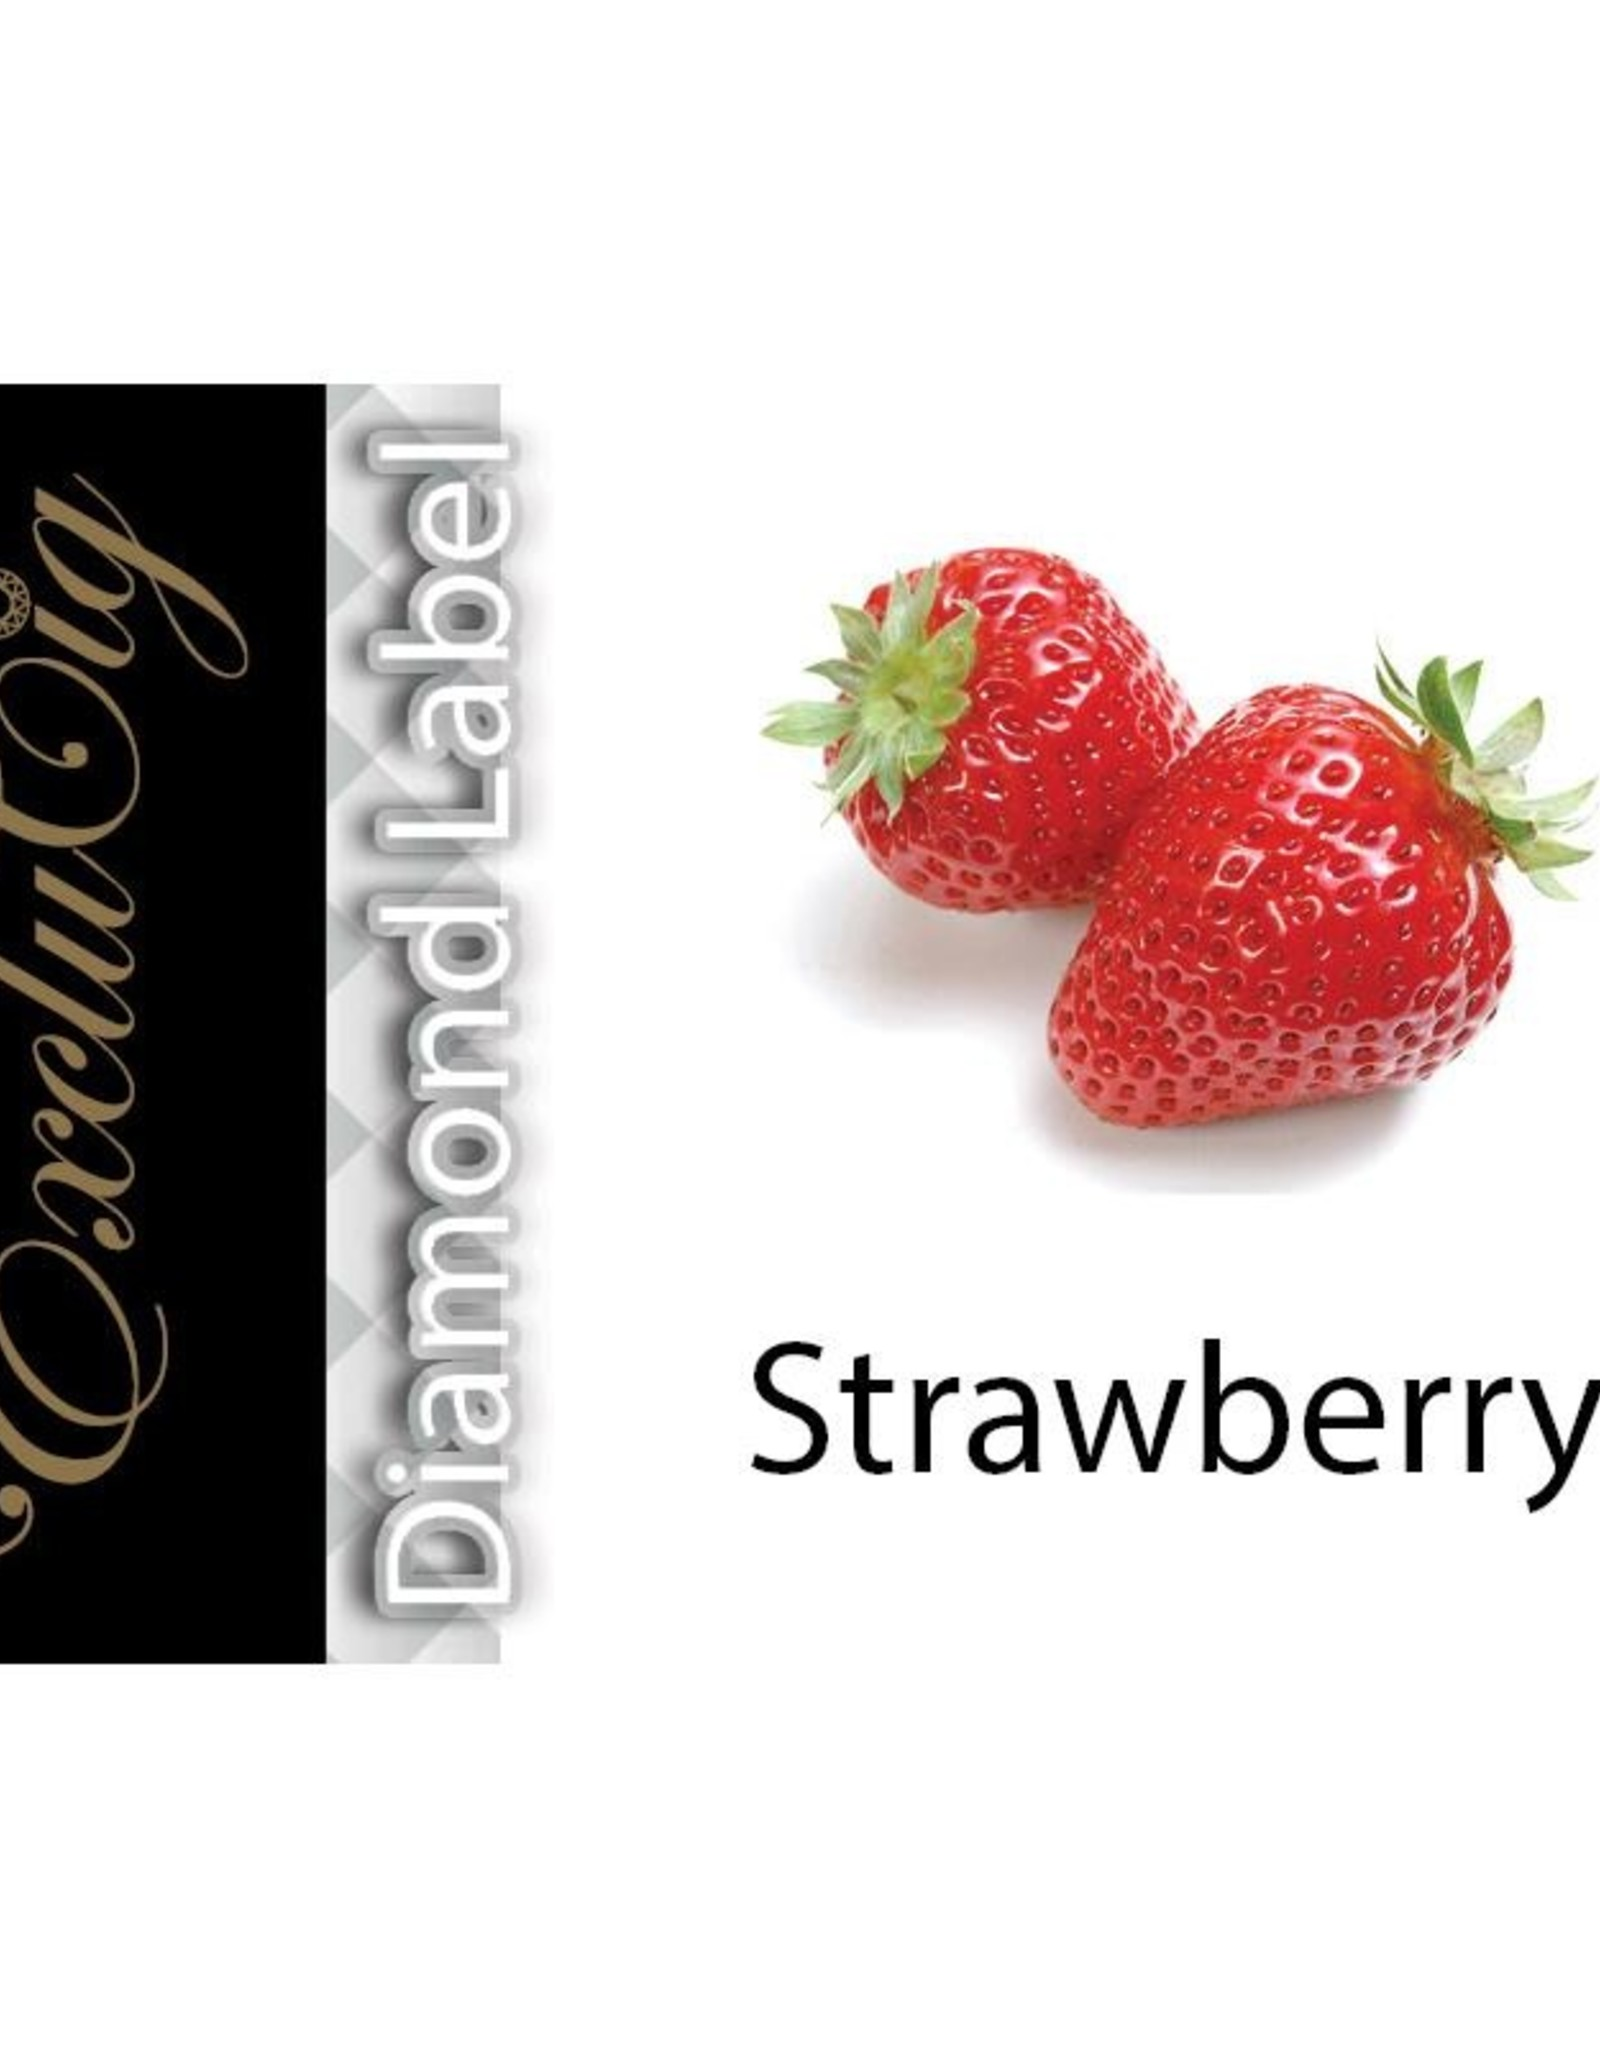 Exclucig Exclucig Diamond Label E-liquid Strawberry 6 mg Nicotine